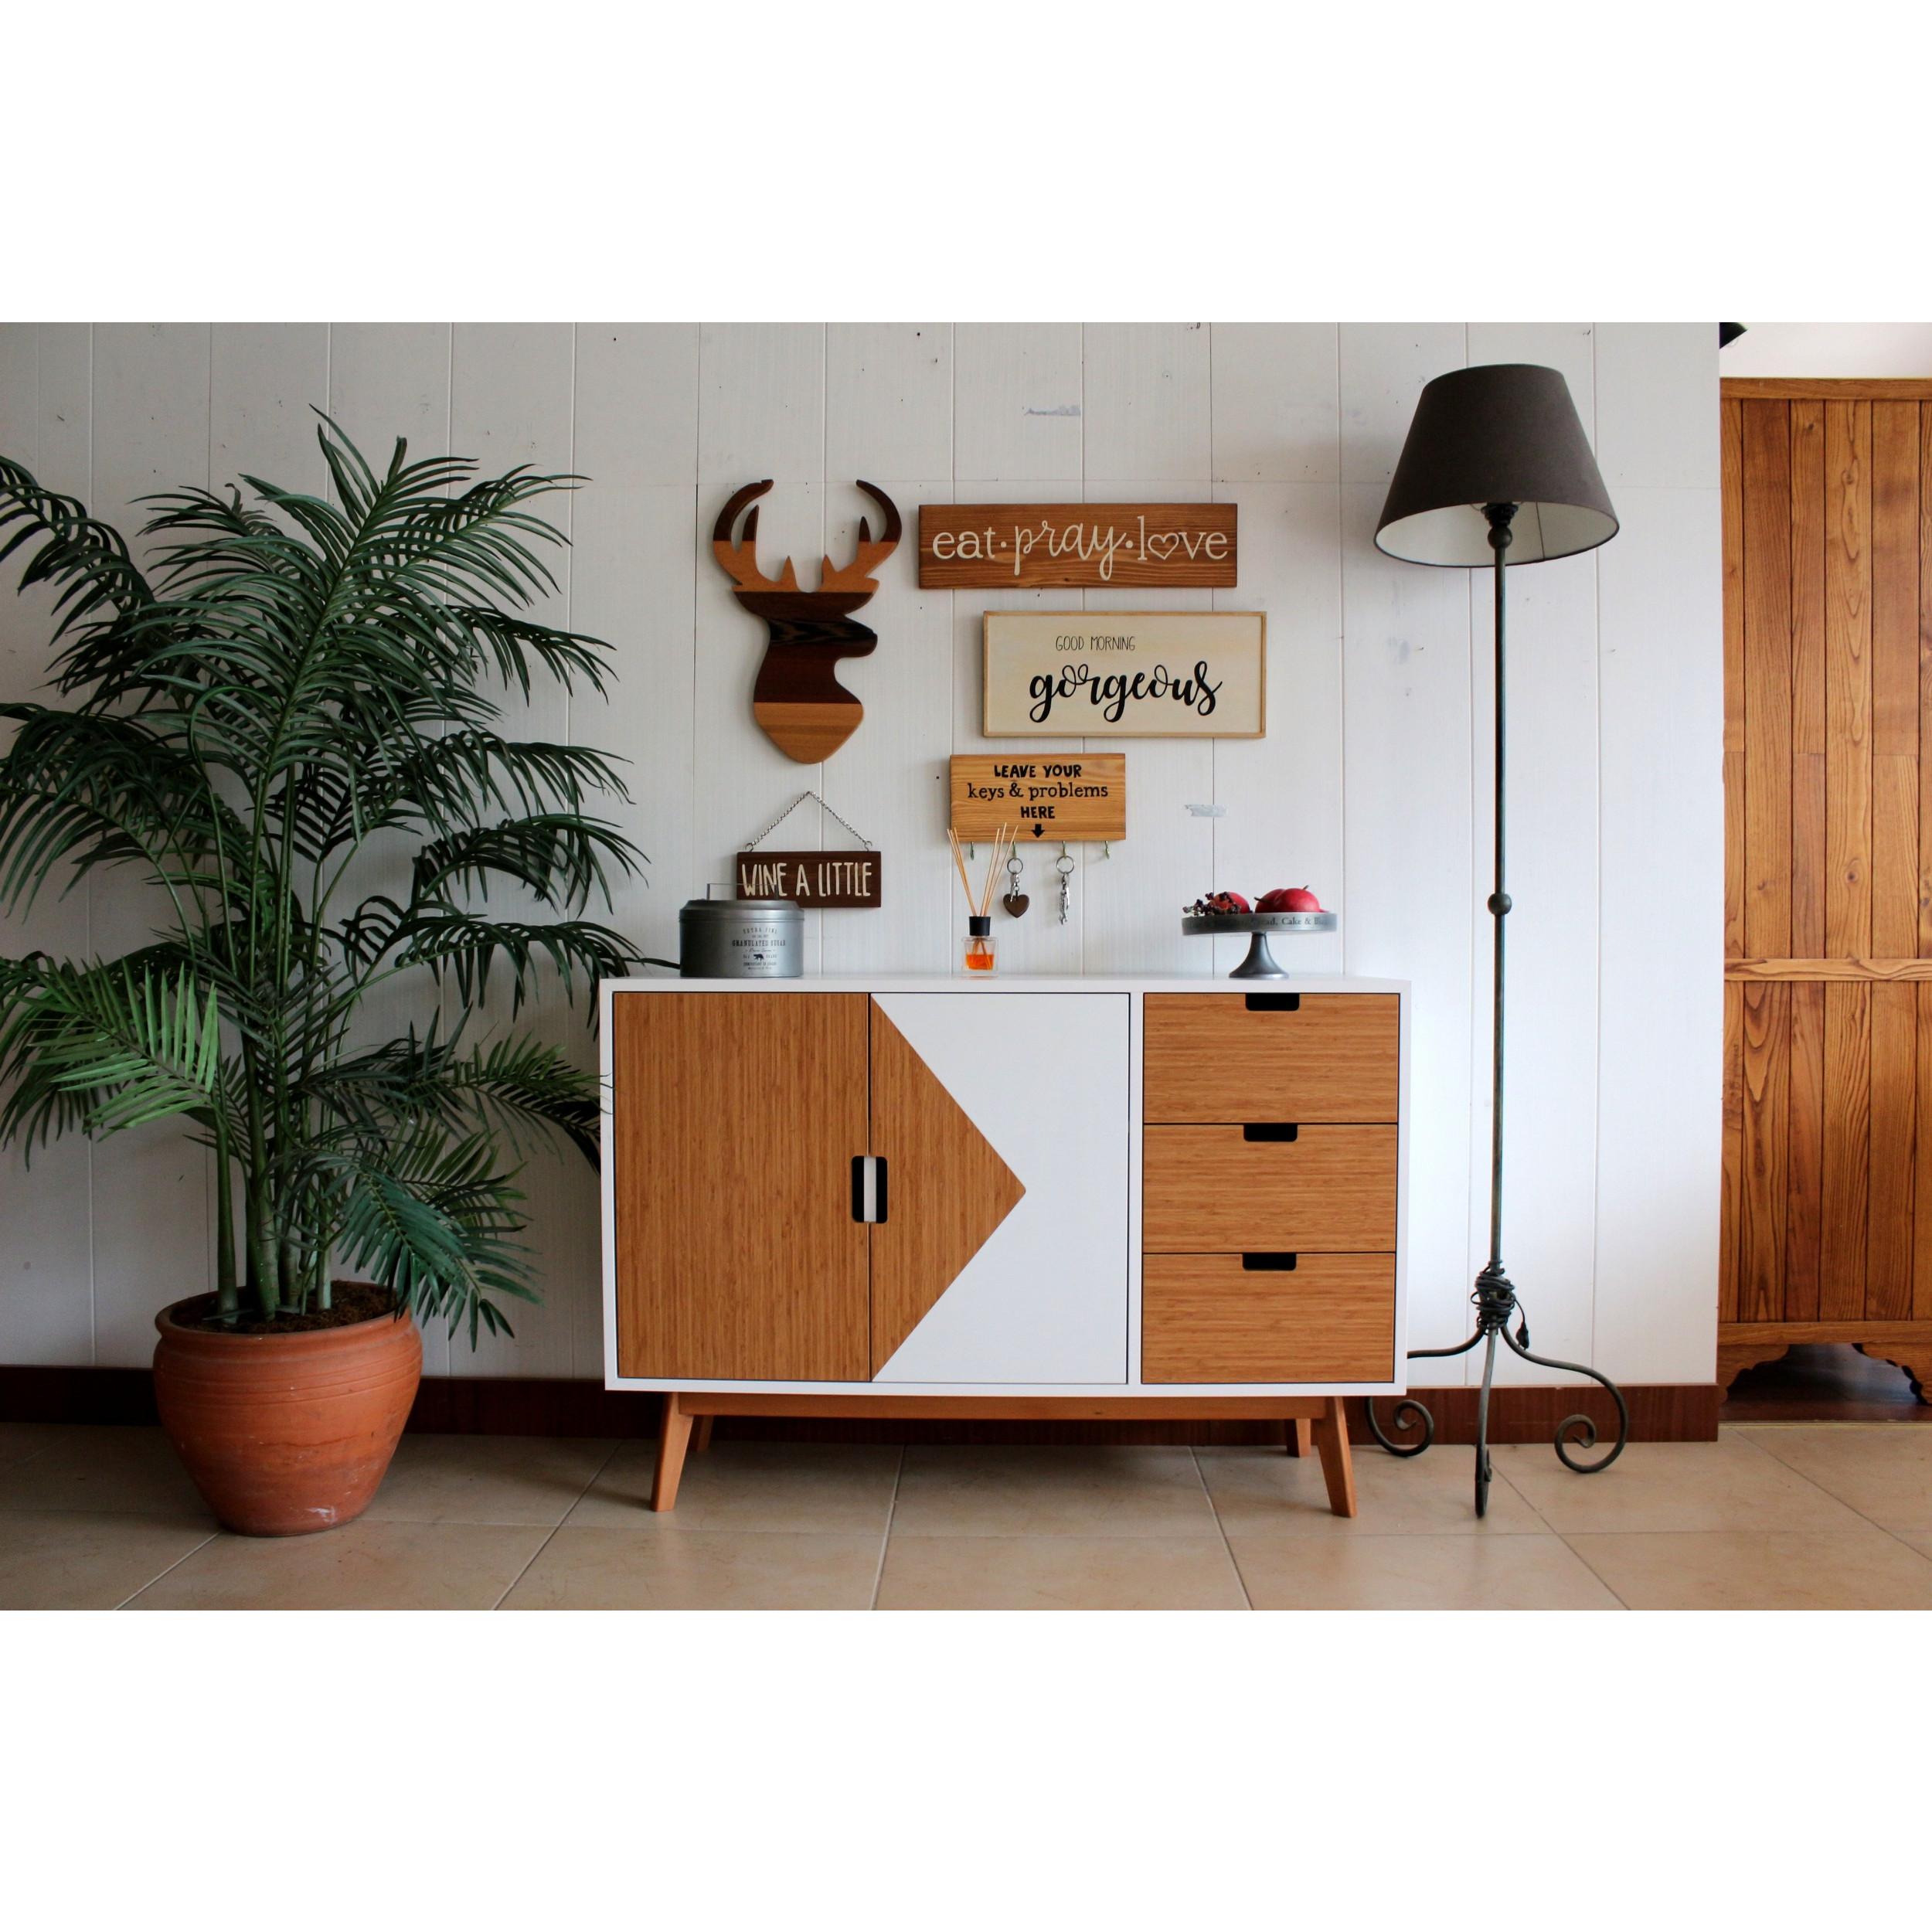 Decorative Wooden Wall Accessory Eat Pray Love   Light Walnut